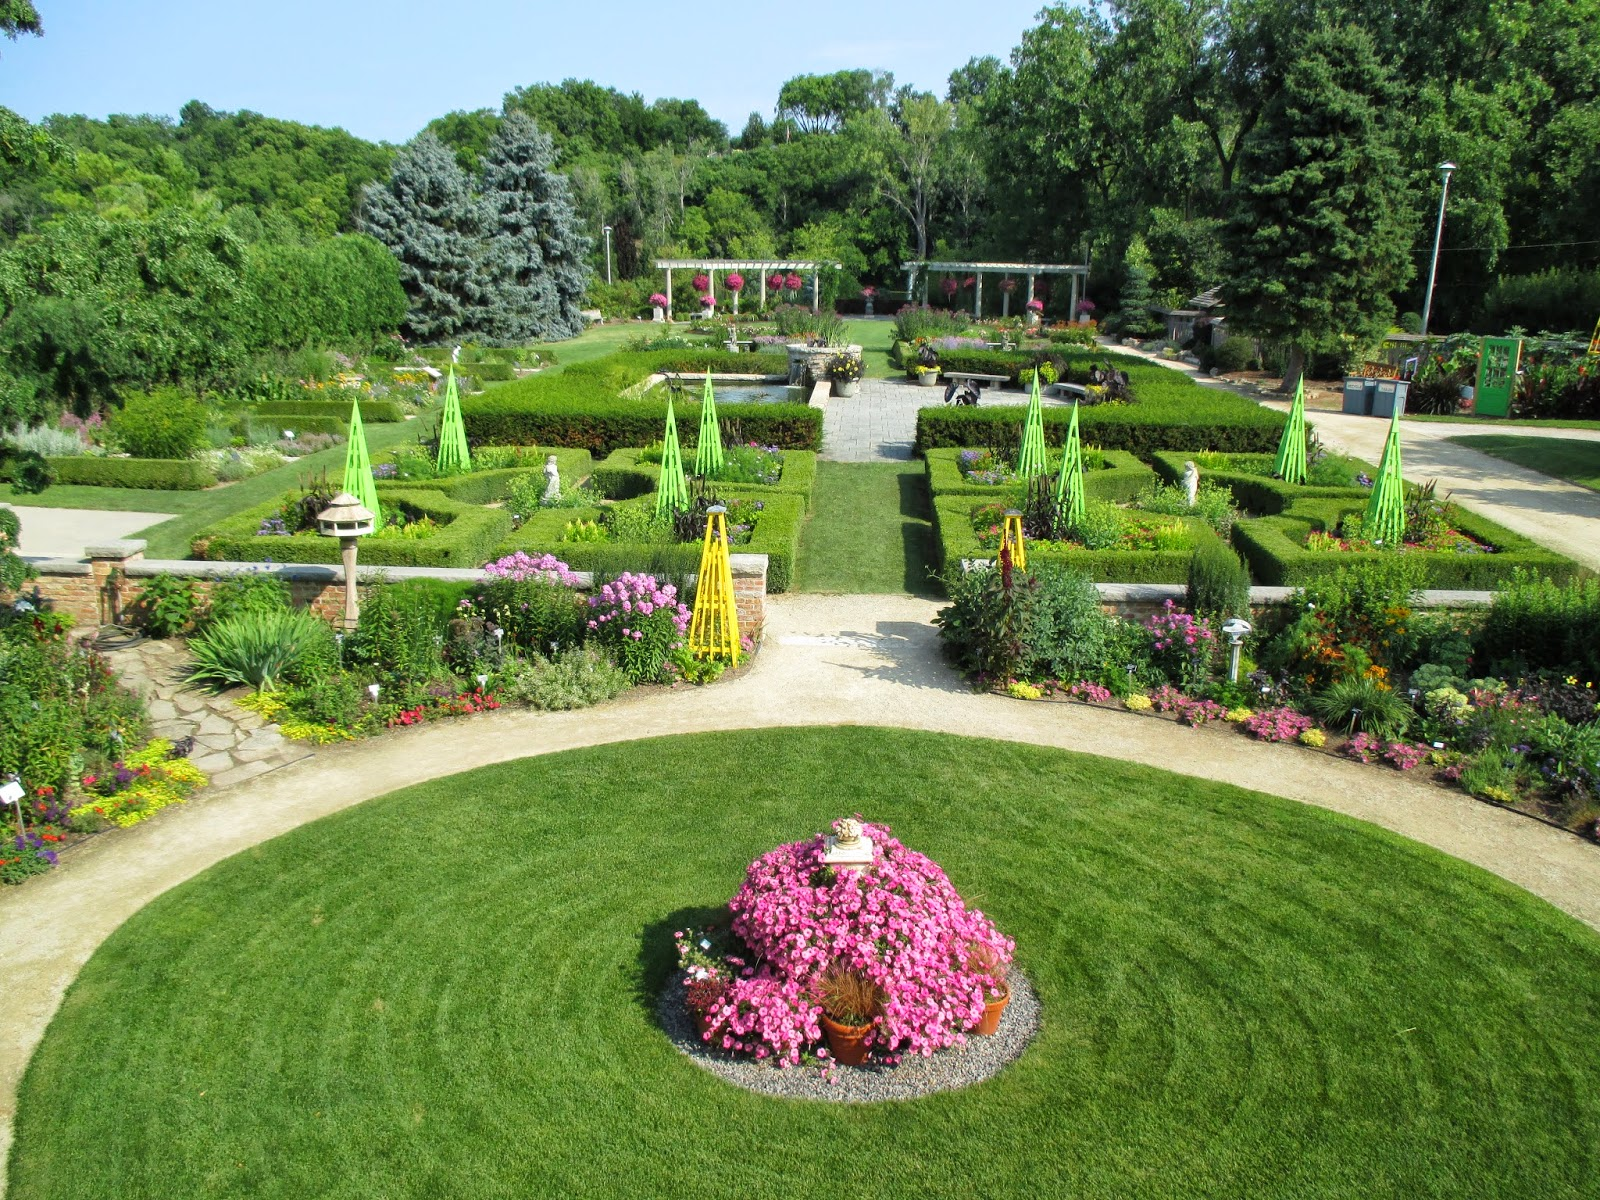 French Formal Rose Garden - Rotary Botanical Gardens